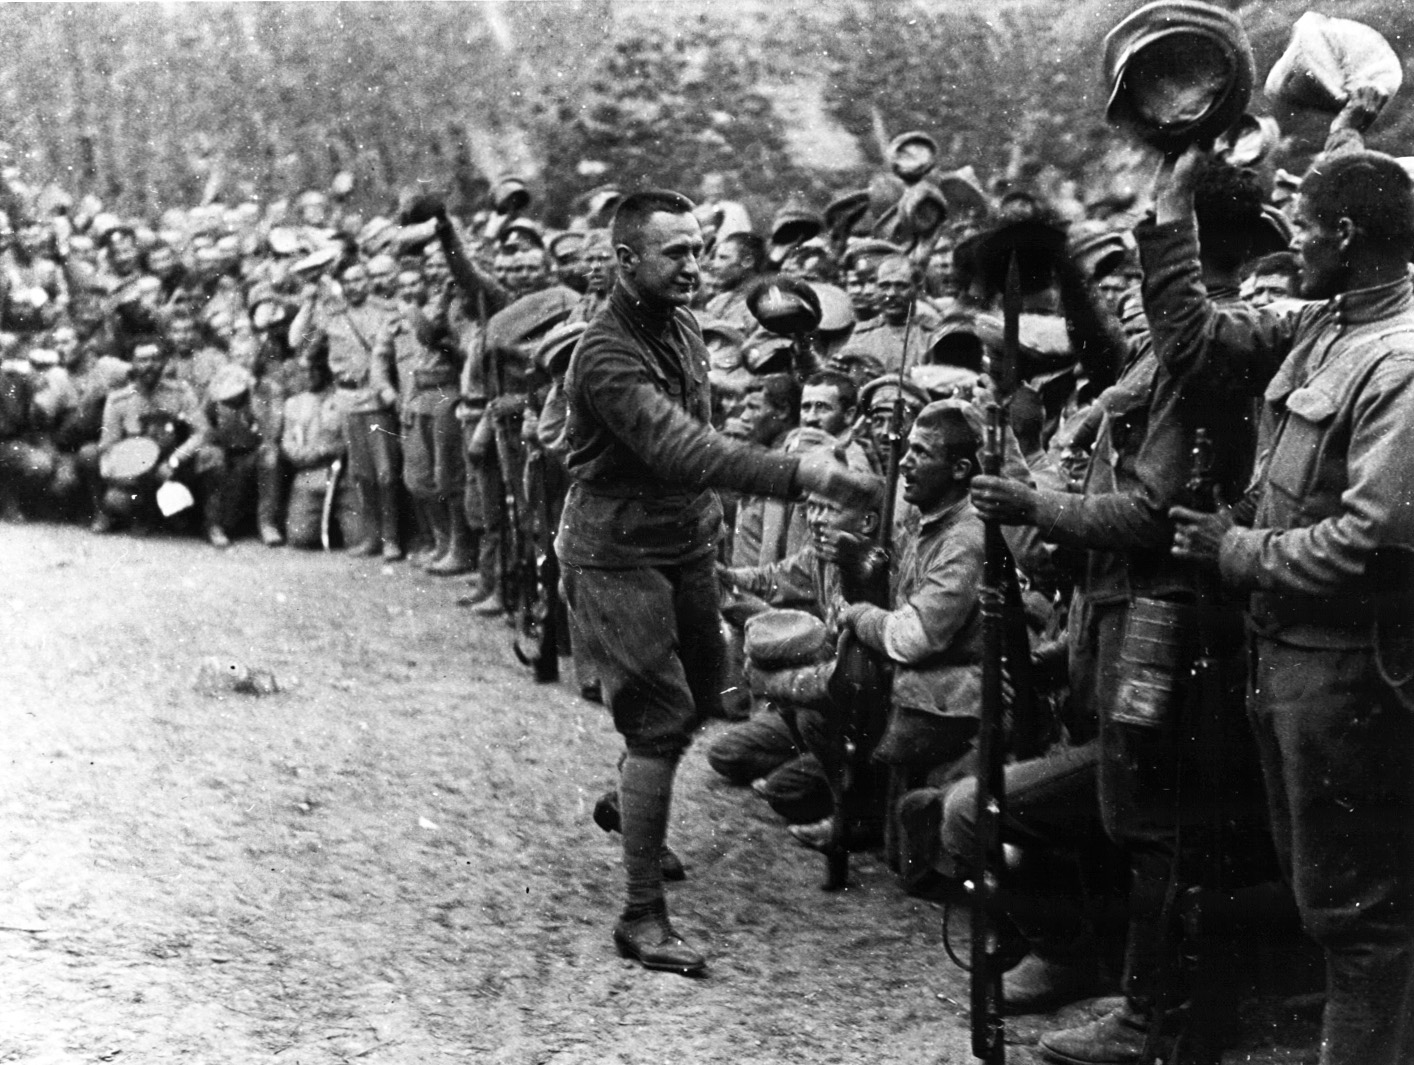 Керенский и солдаты